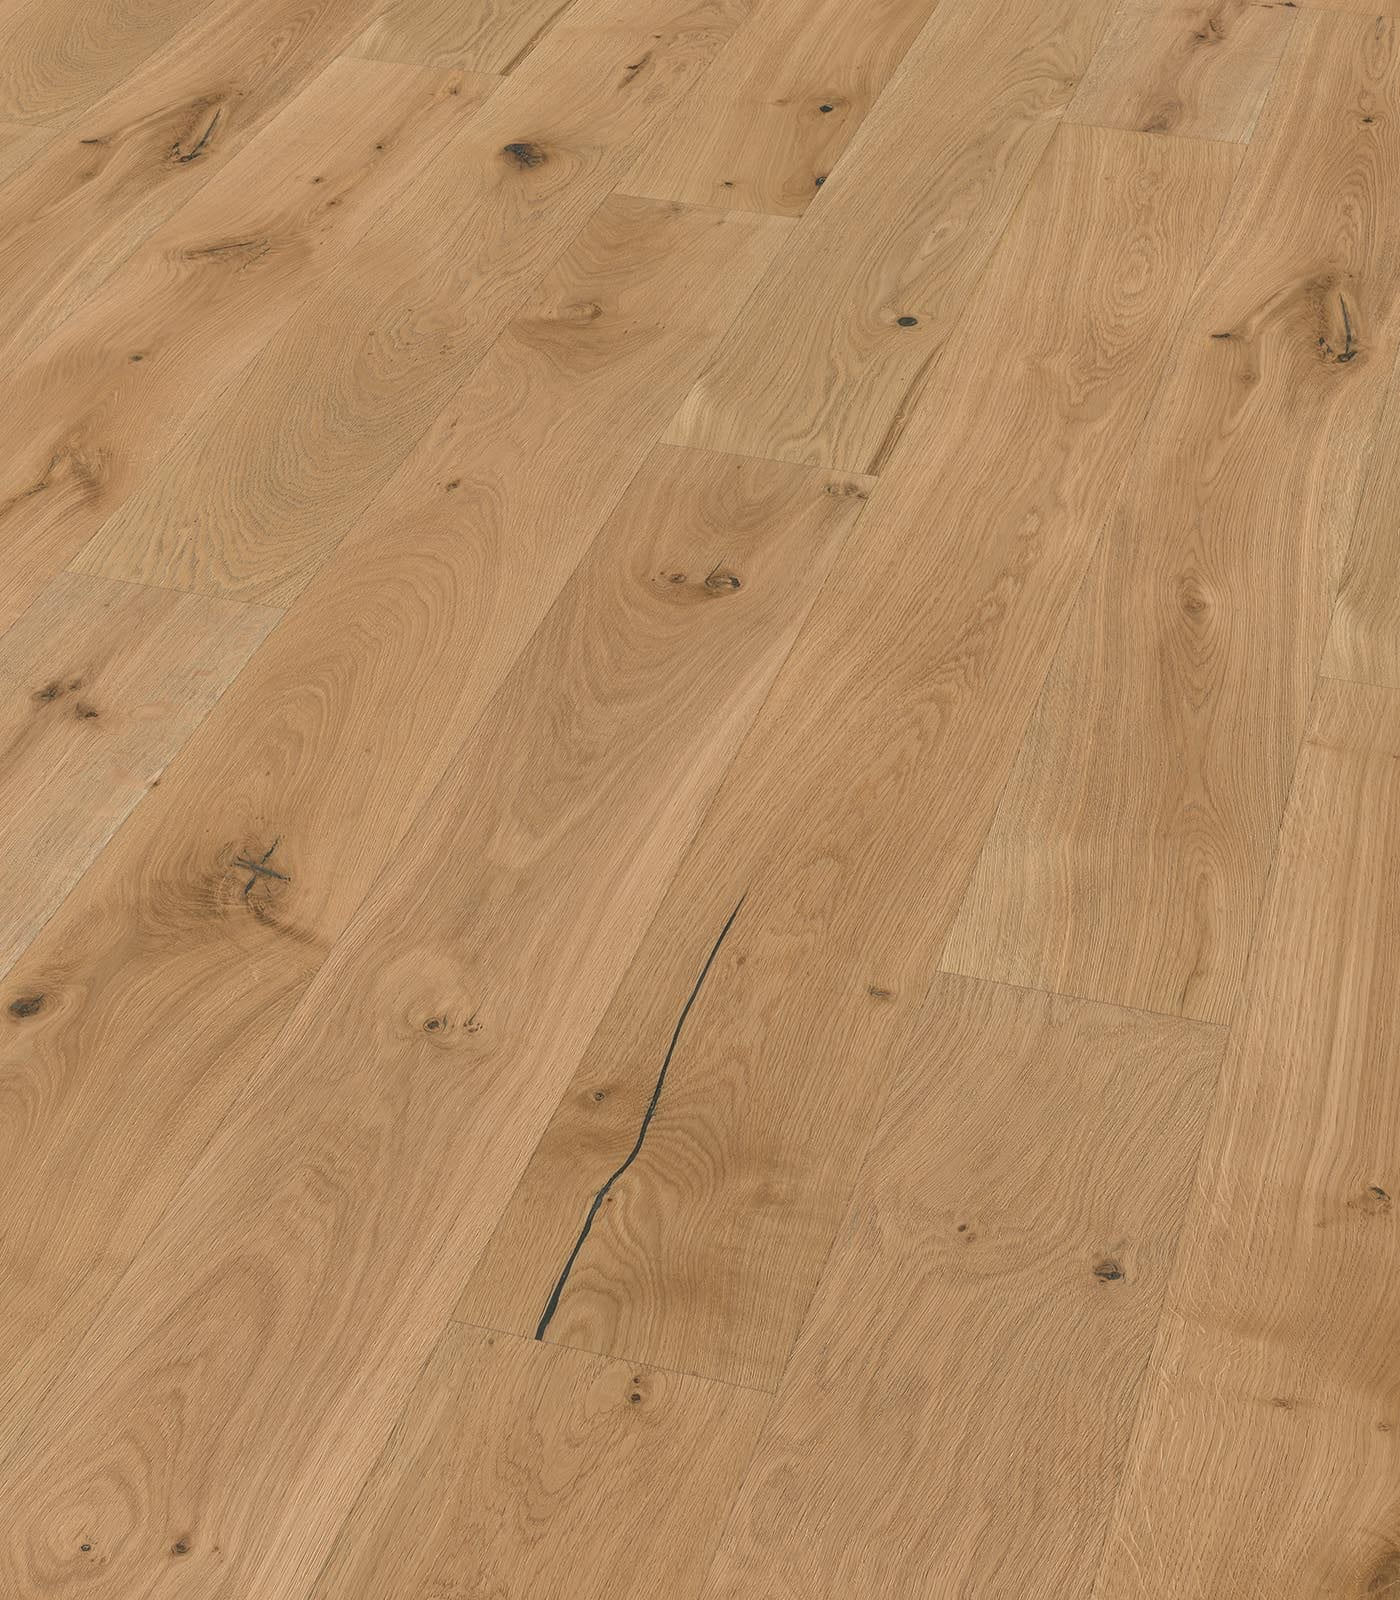 Annapurna-Floors European Oak-Antique Collection